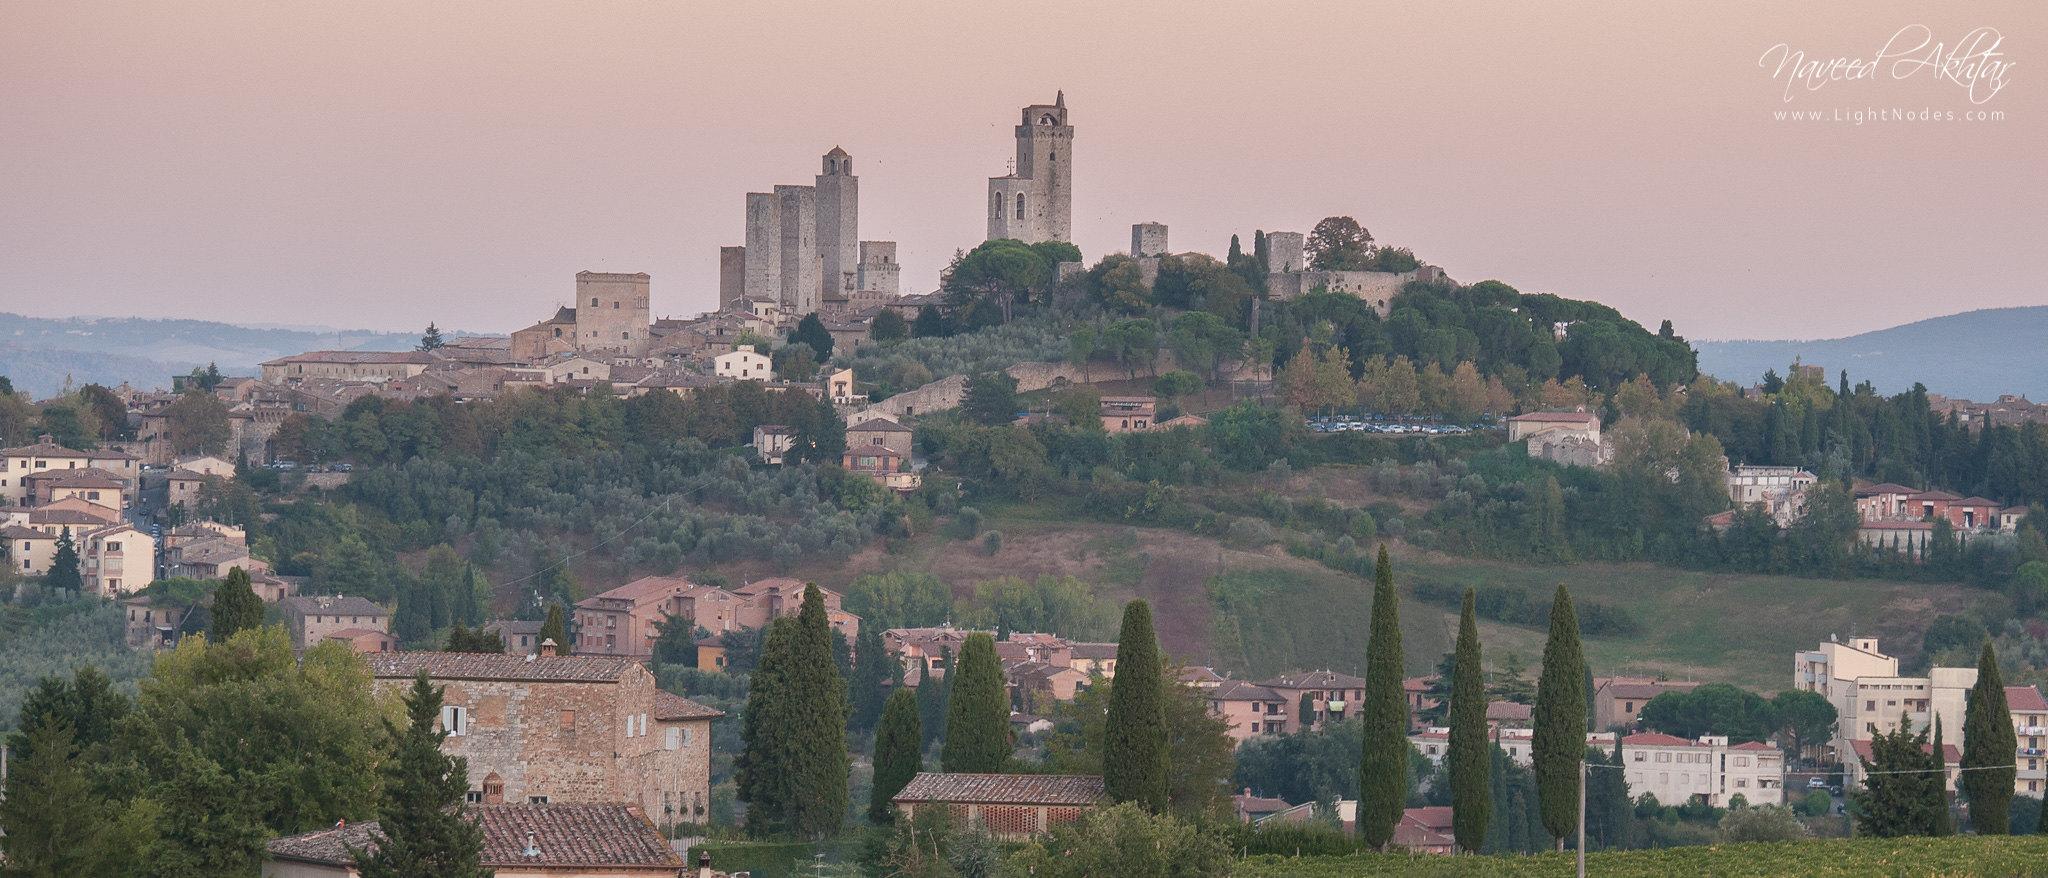 San Gimignano (Medieval Manhattan) of Tuscany with Panasonic DMC-GH1